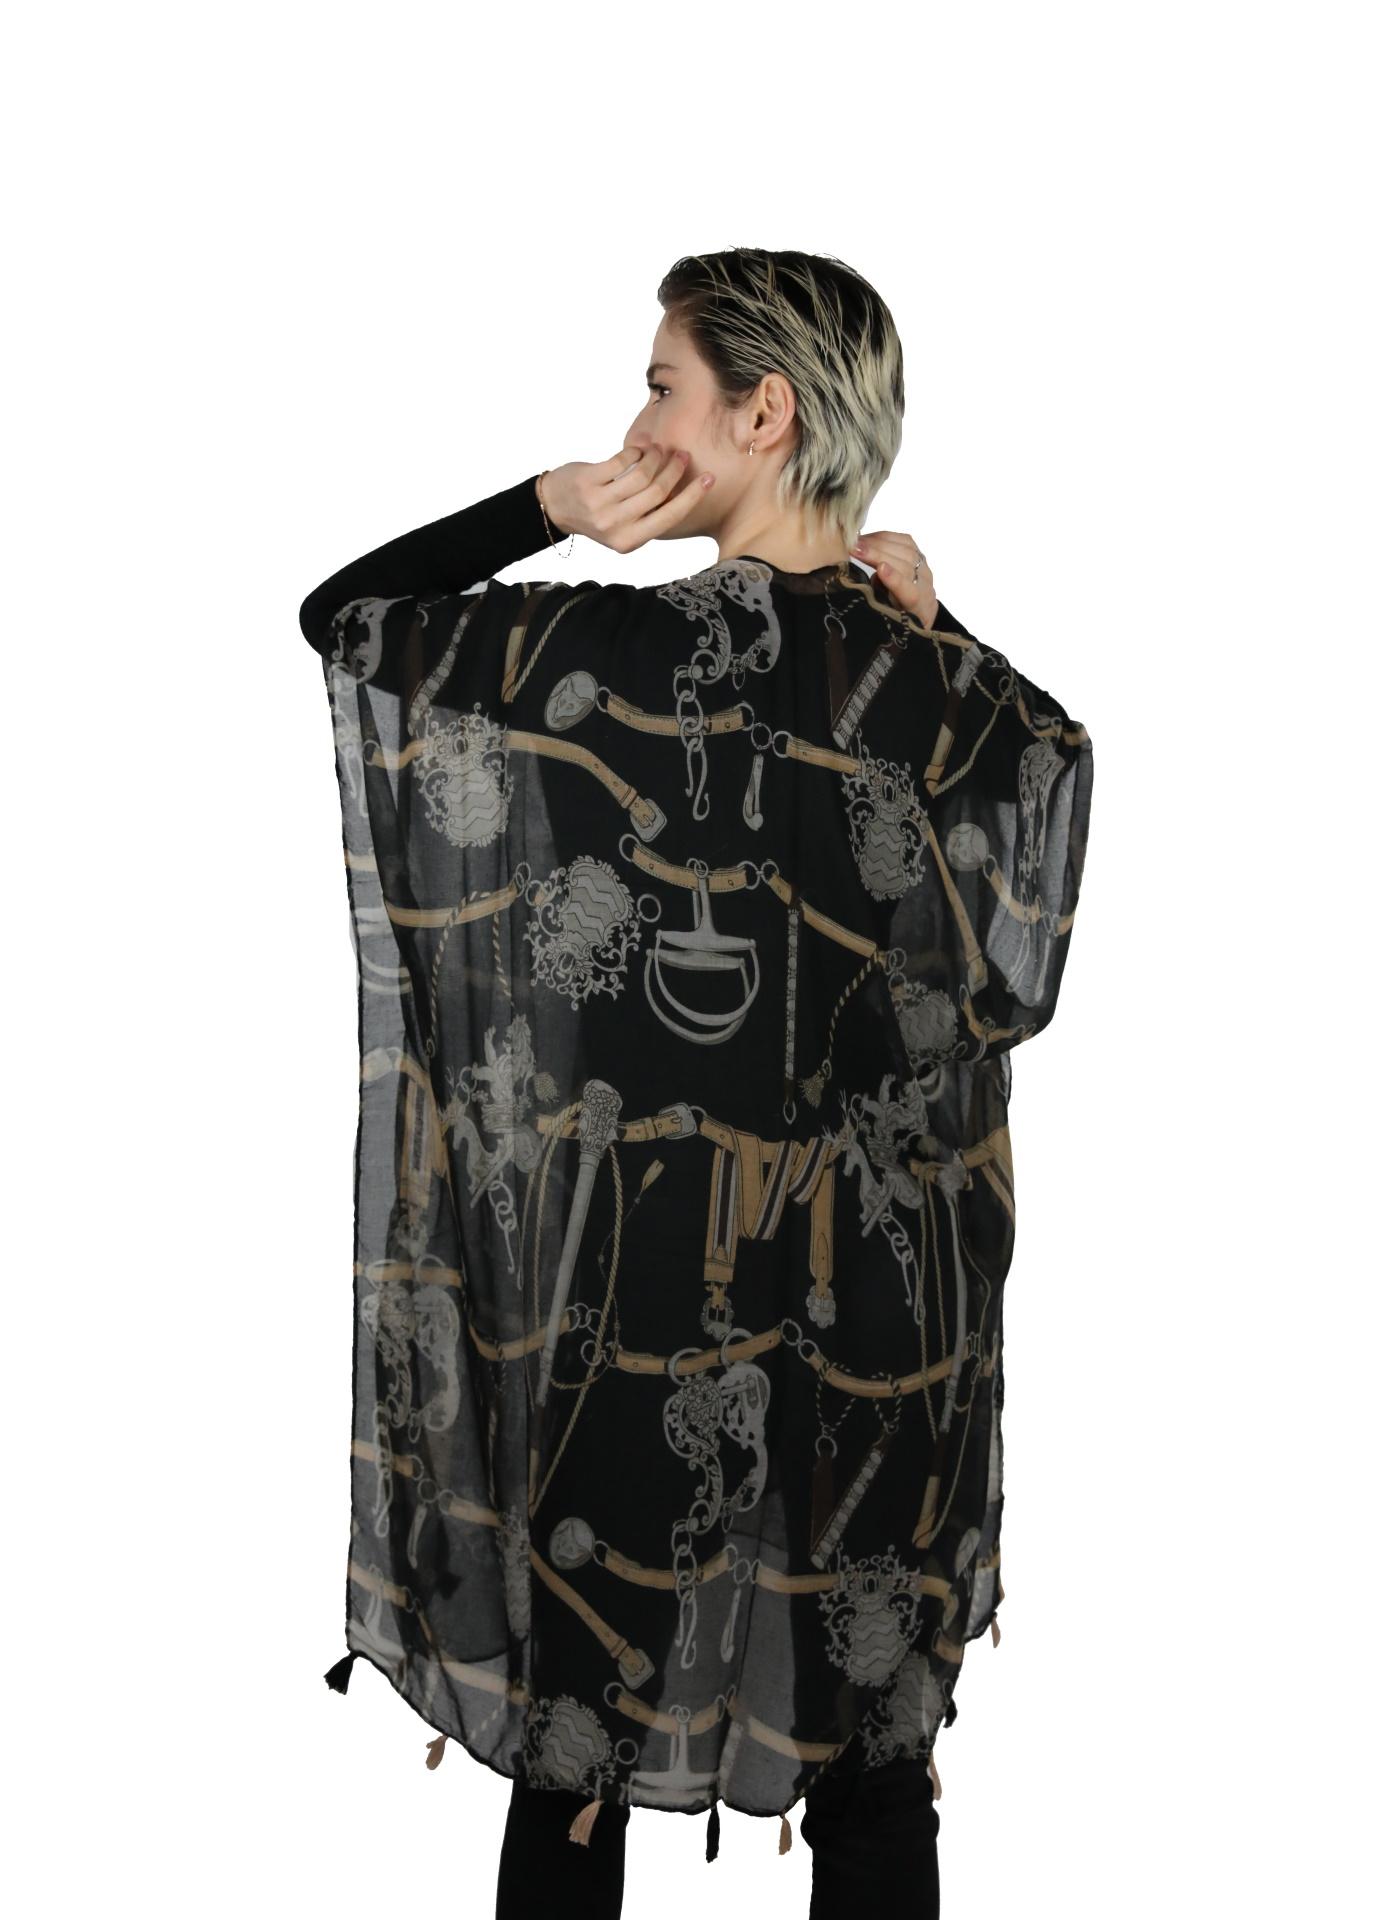 CLOTHES08 STOLA DONNA FOULARD CARDIGAN COPRISPALLE 1 1stAmerican elegante stola da donna foulard cardigan coprispalle